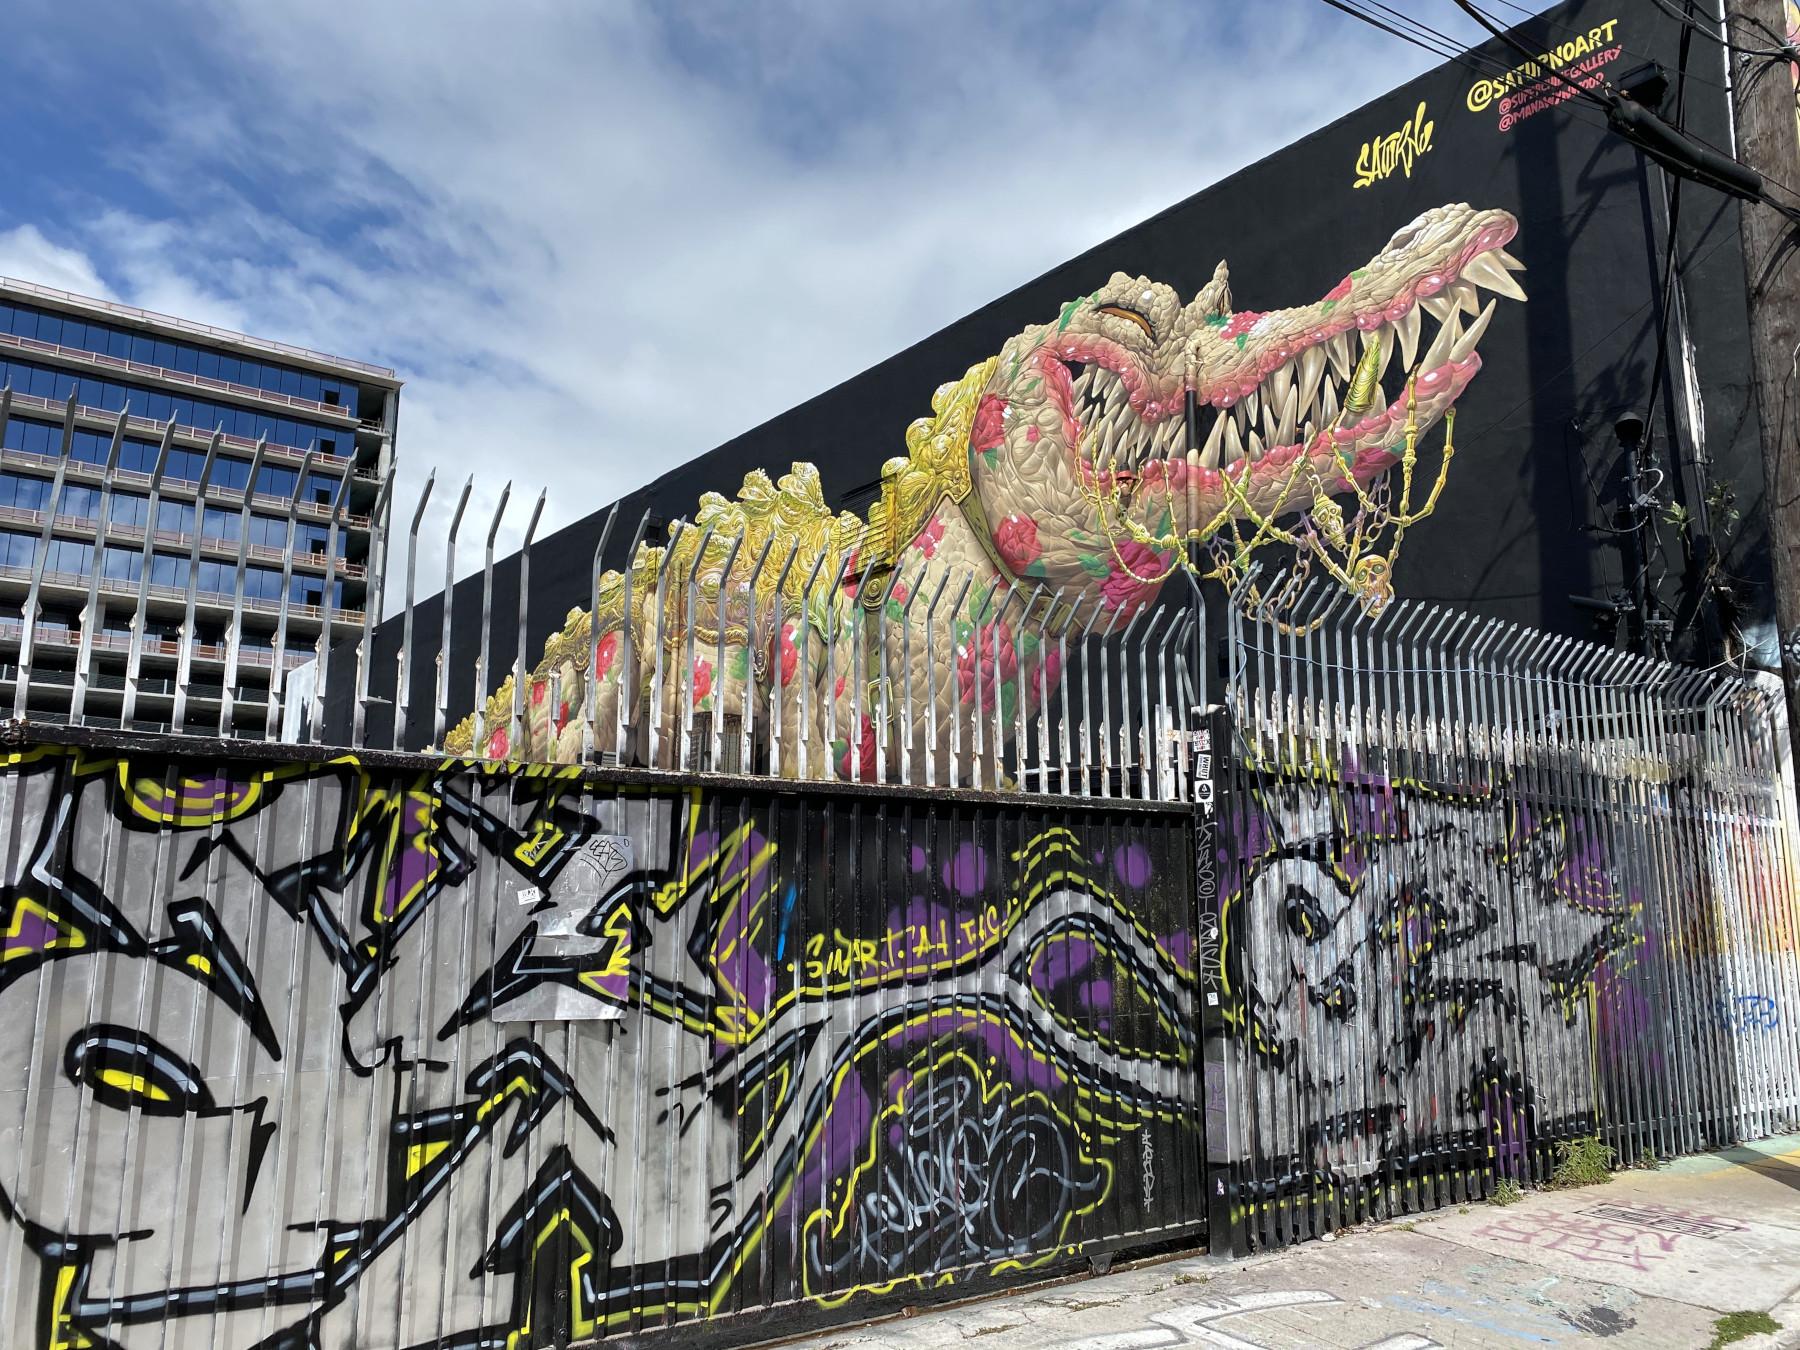 Saturno Street Art